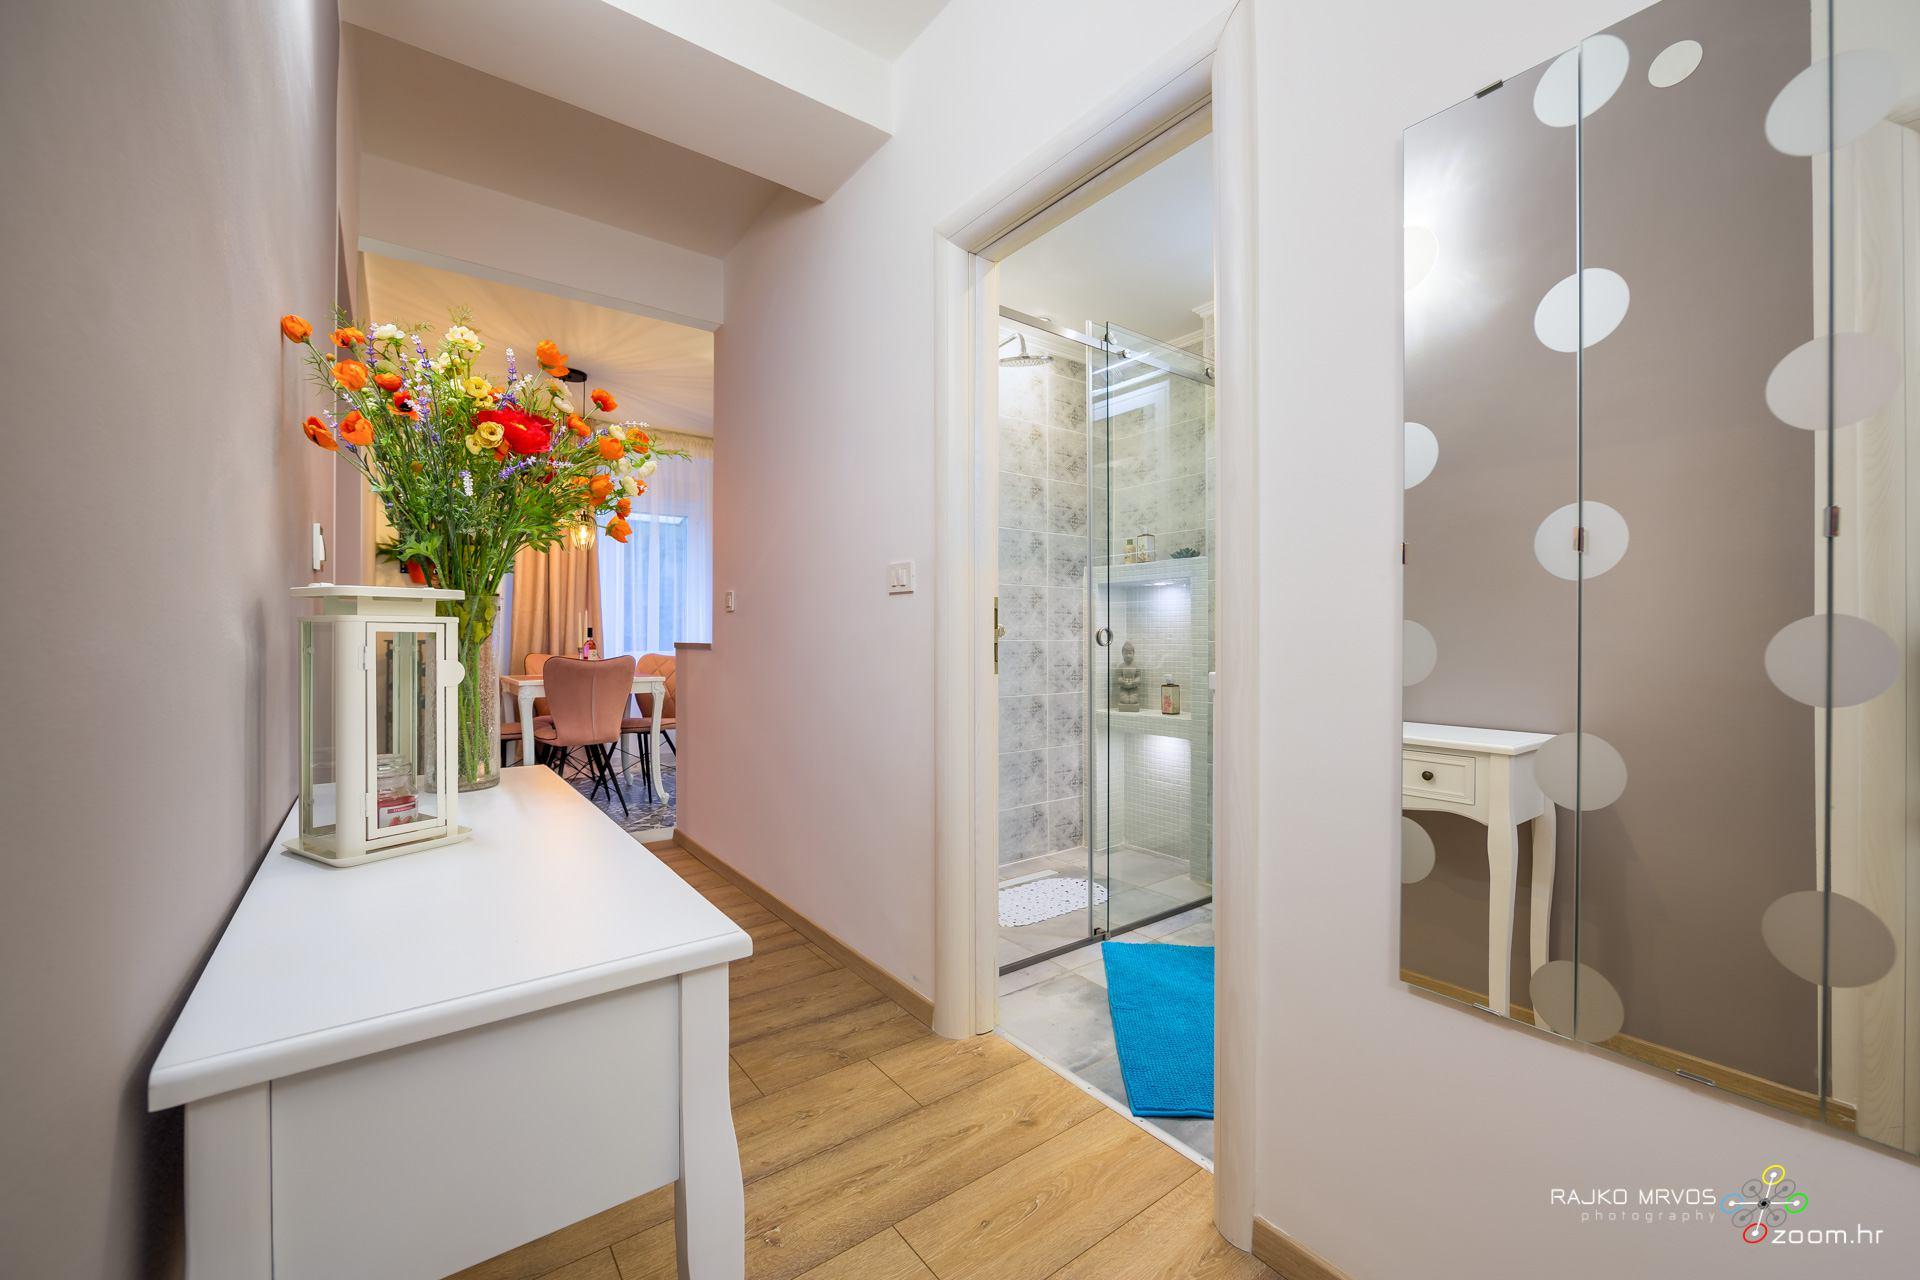 fotografiranje-interijera-fotograf-apartmana-vila-kuca-hotela-apartman-Gabby-Rijeka-4